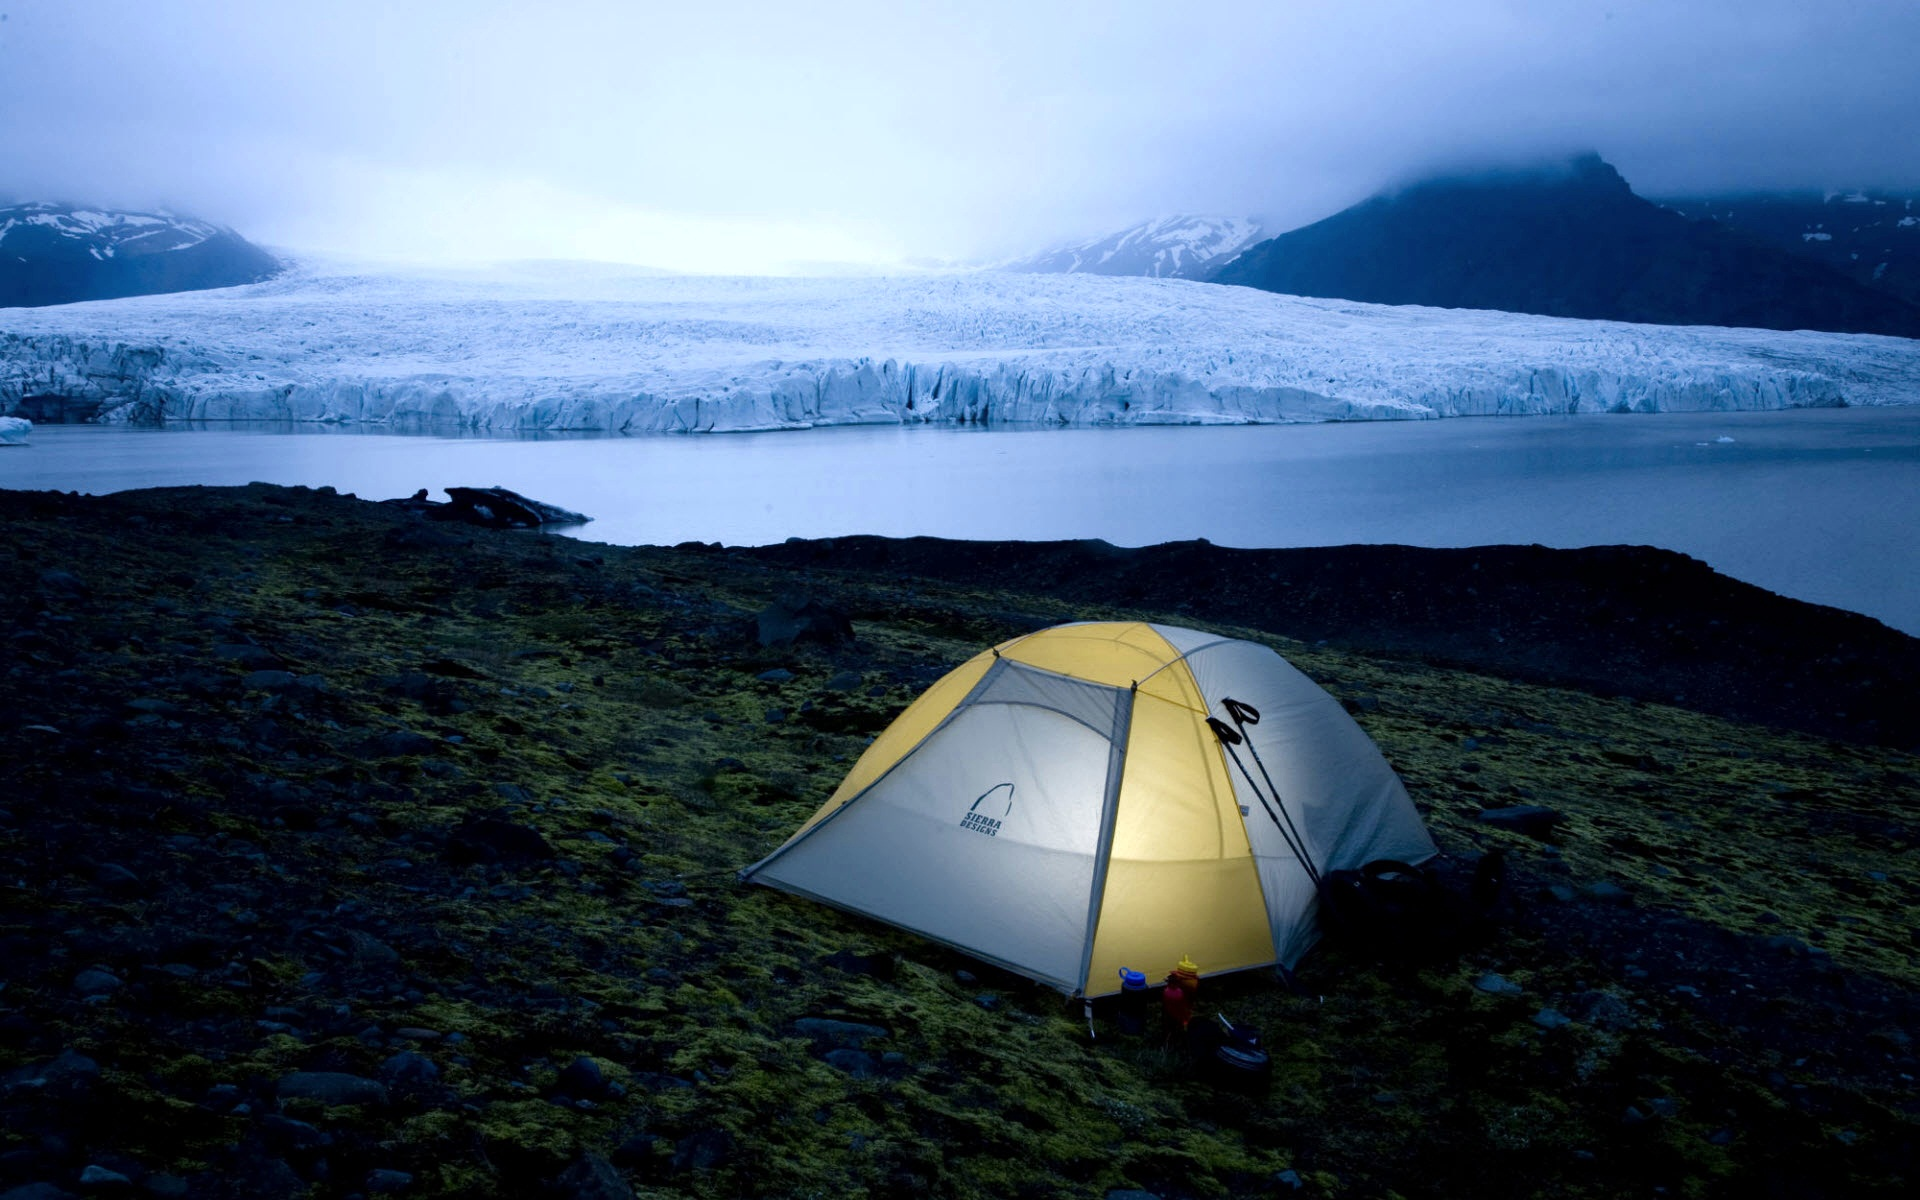 48] Camping Wallpaper Backgrounds on WallpaperSafari 1920x1200